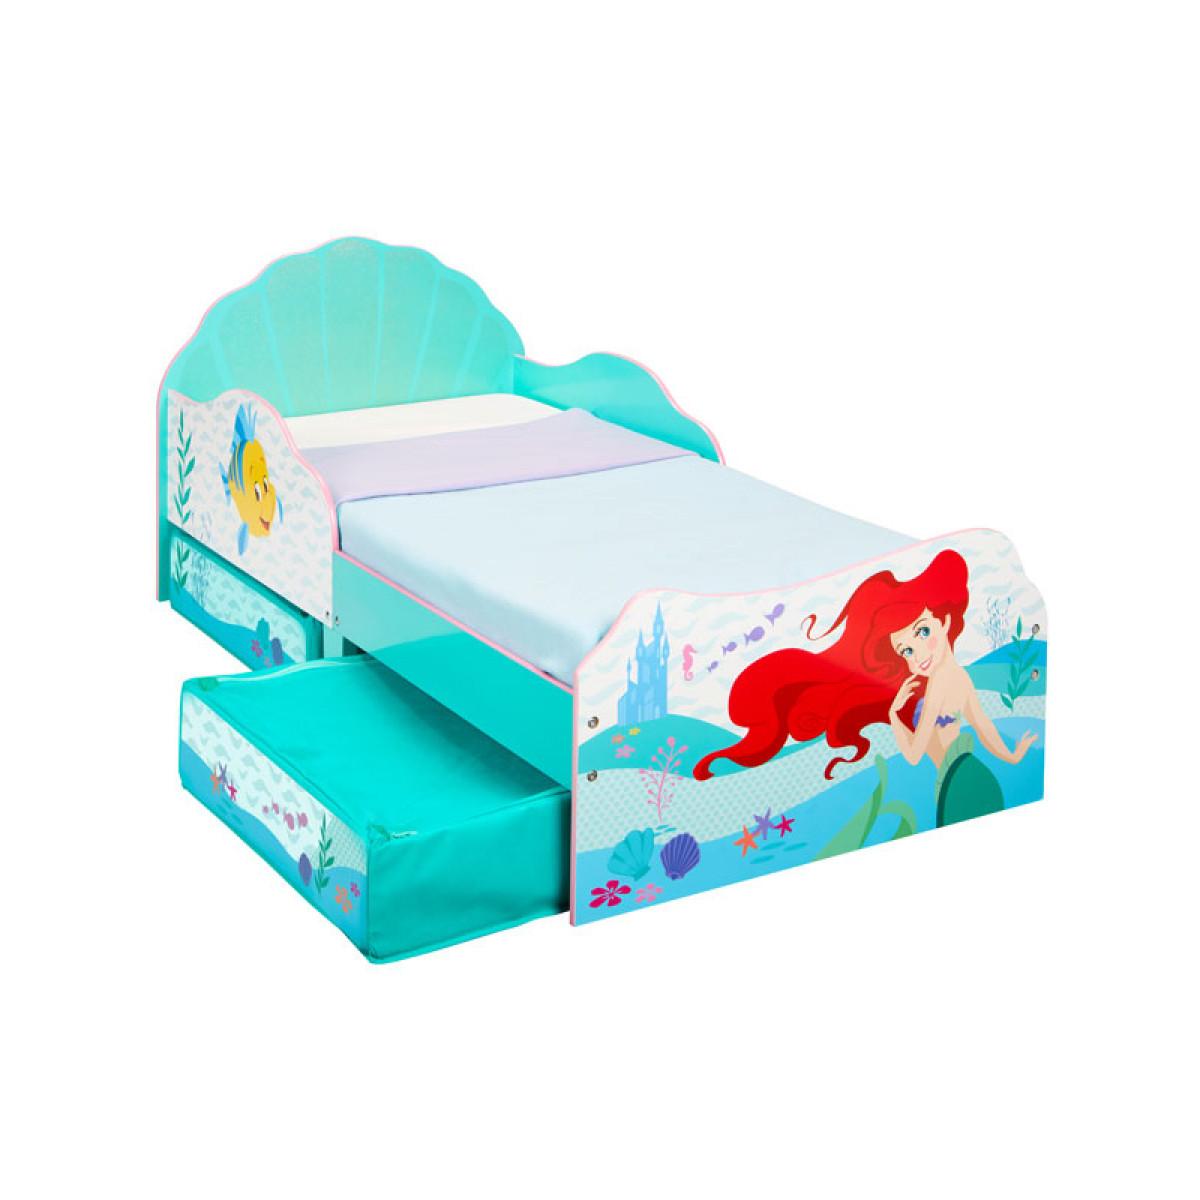 Disney Princess Ariel Toddler Bed With Sprung Mattress and ...